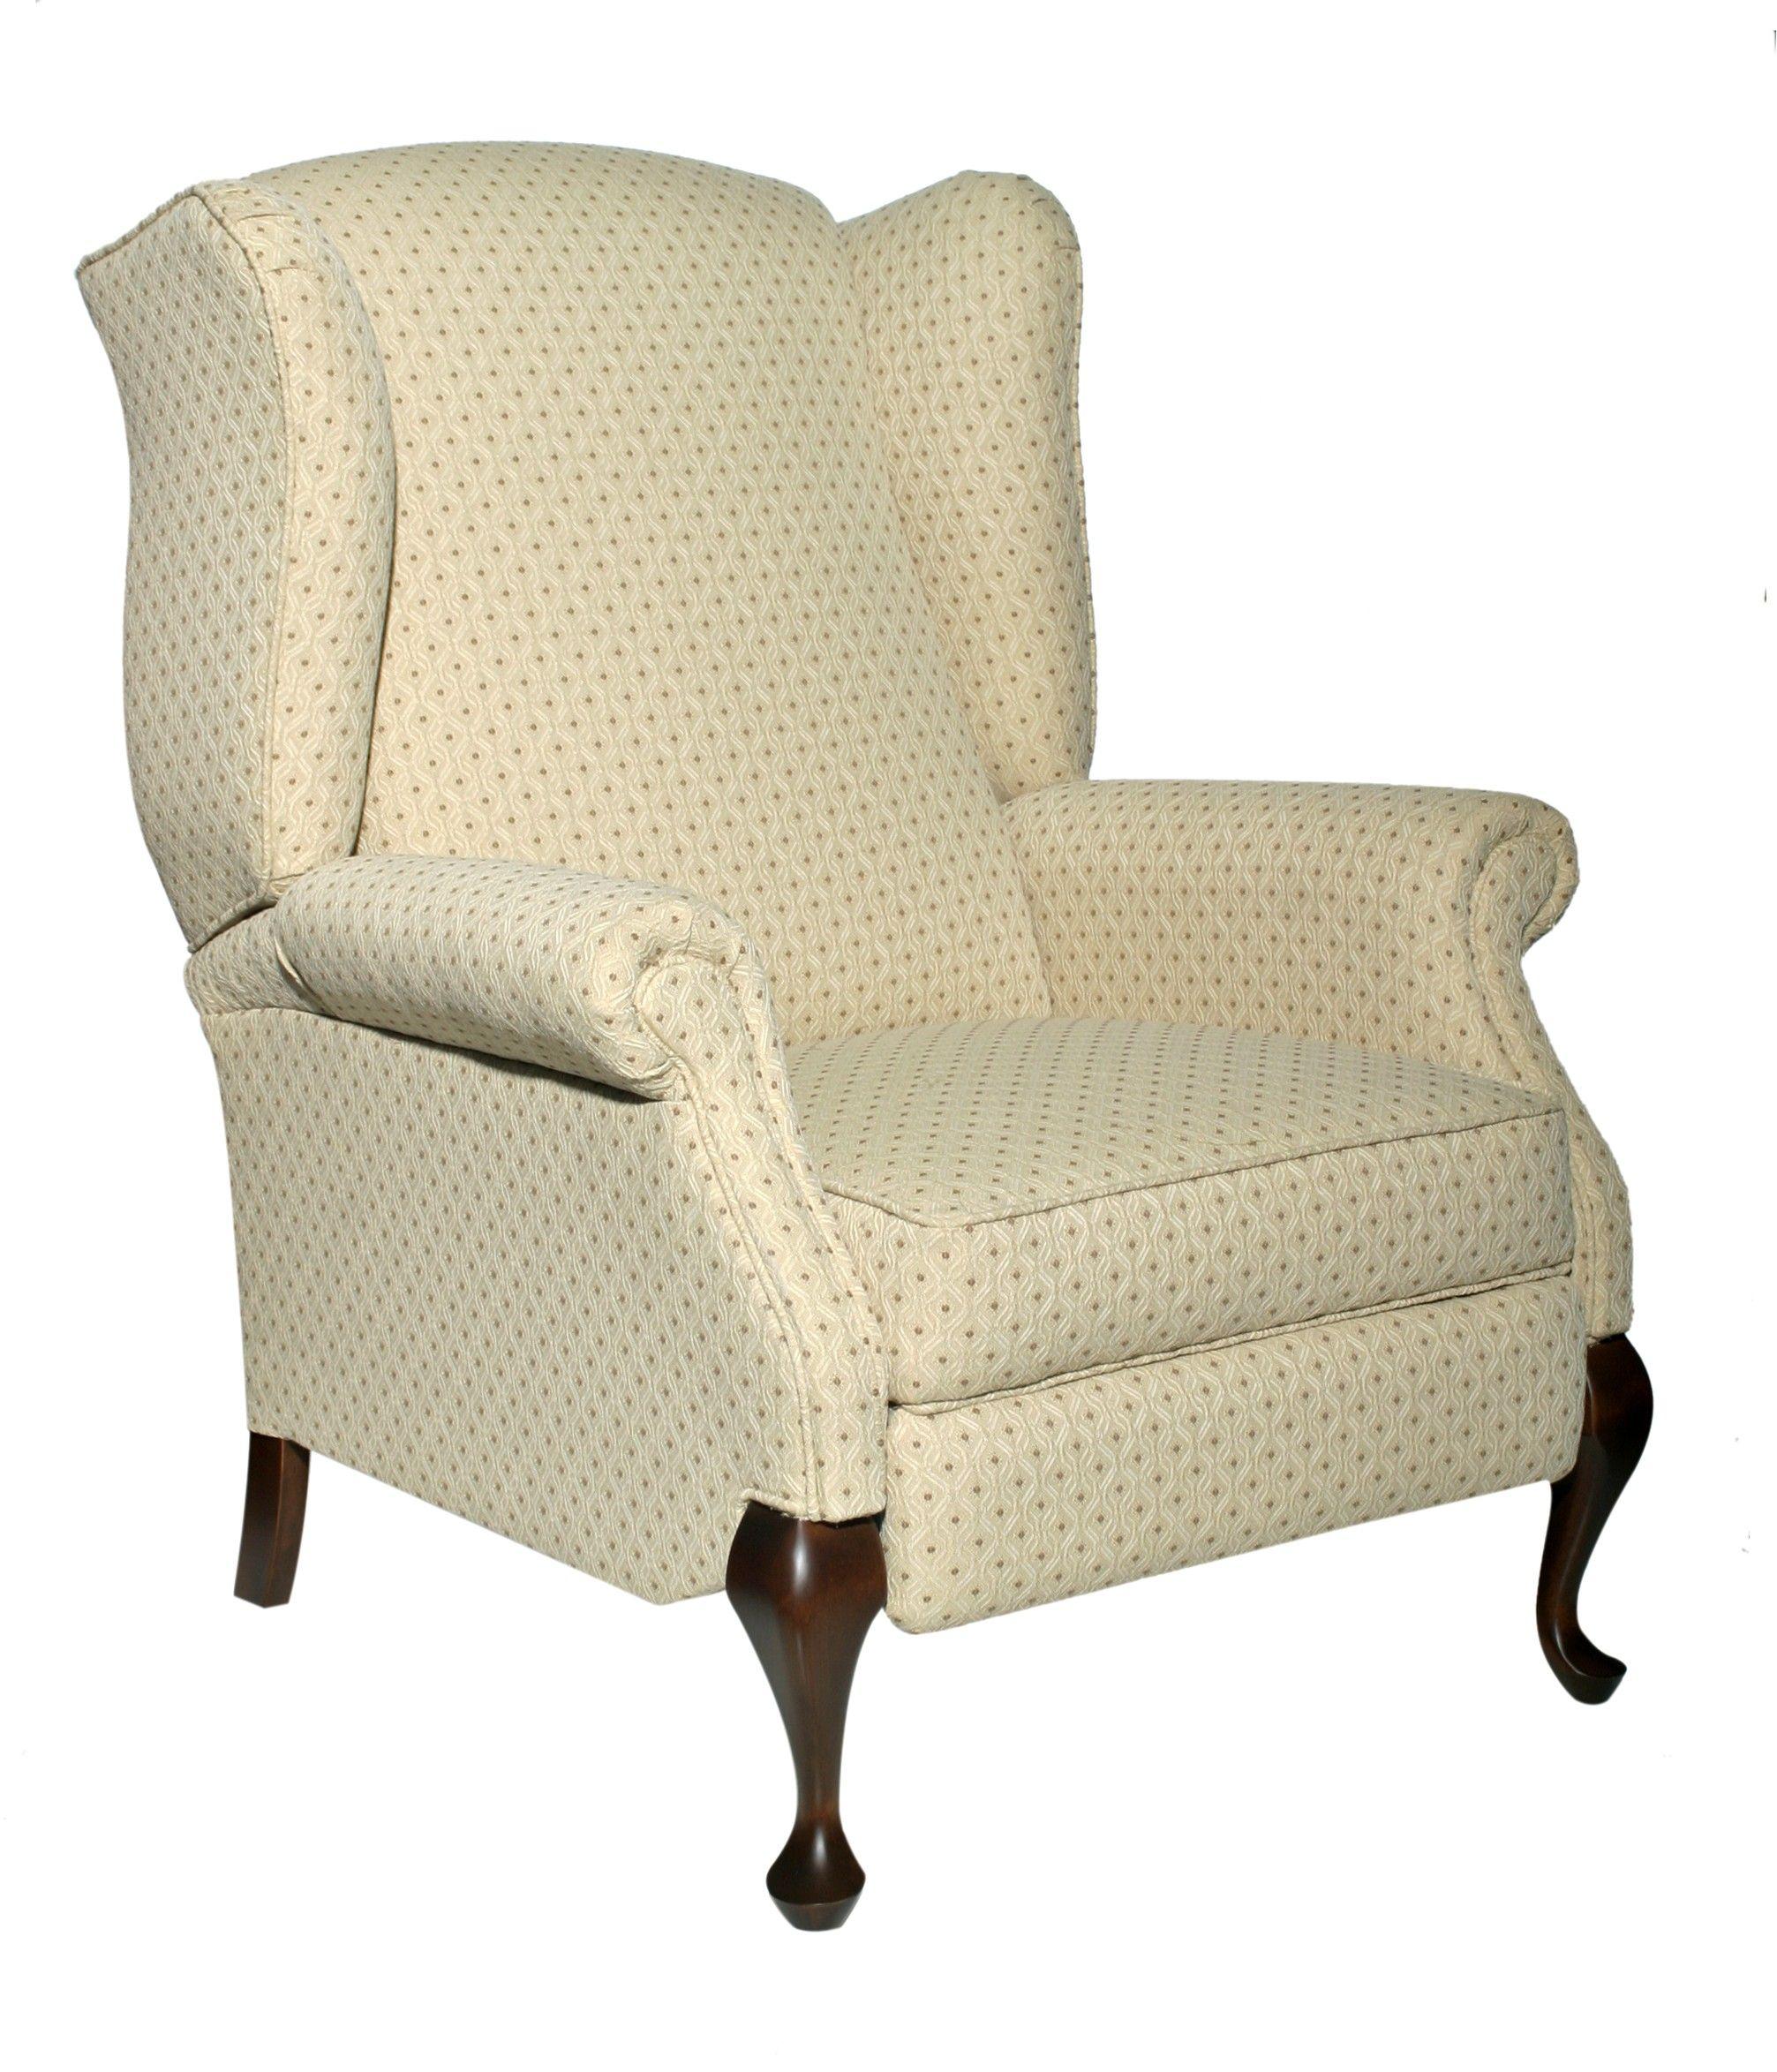 Sessel Lehnsessel Grau Sessel Billig Seite Stuhle Fur Wohnzimmer Blau Sessel Accent Sessel Set Stuhle Akzentstuhle Royal Mobel Coole Mobel